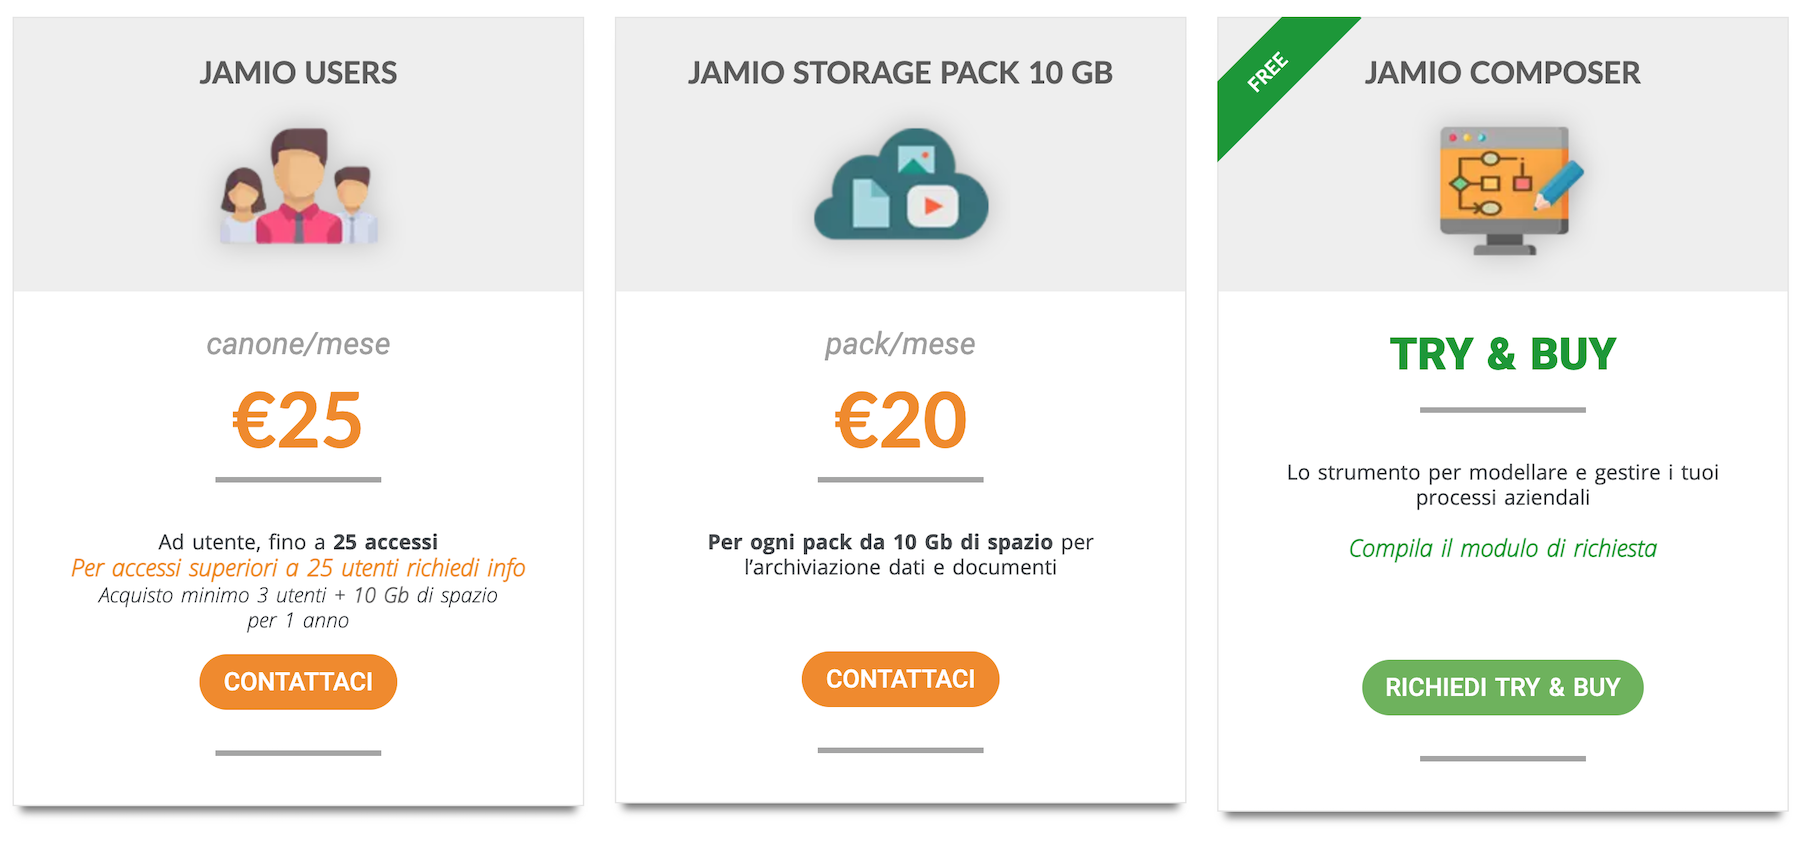 jamio openwork prezzi